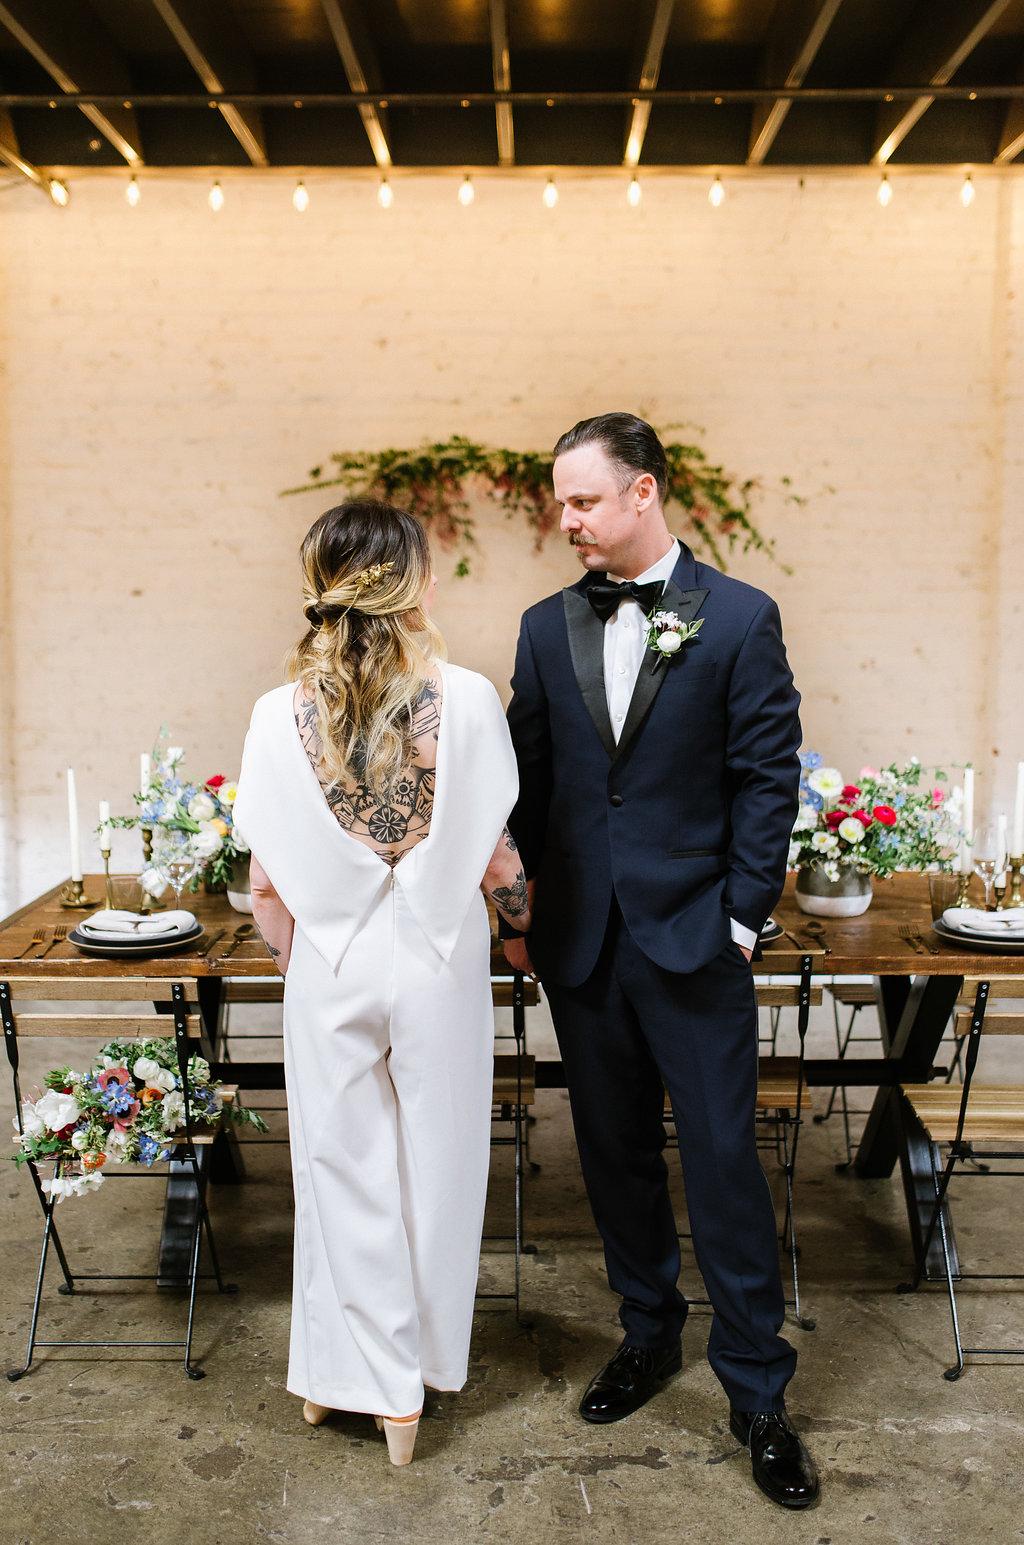 wedding jumpsuits - photo by Chelsea Dier Photography https://ruffledblog.com/modern-san-francisco-winery-elopement